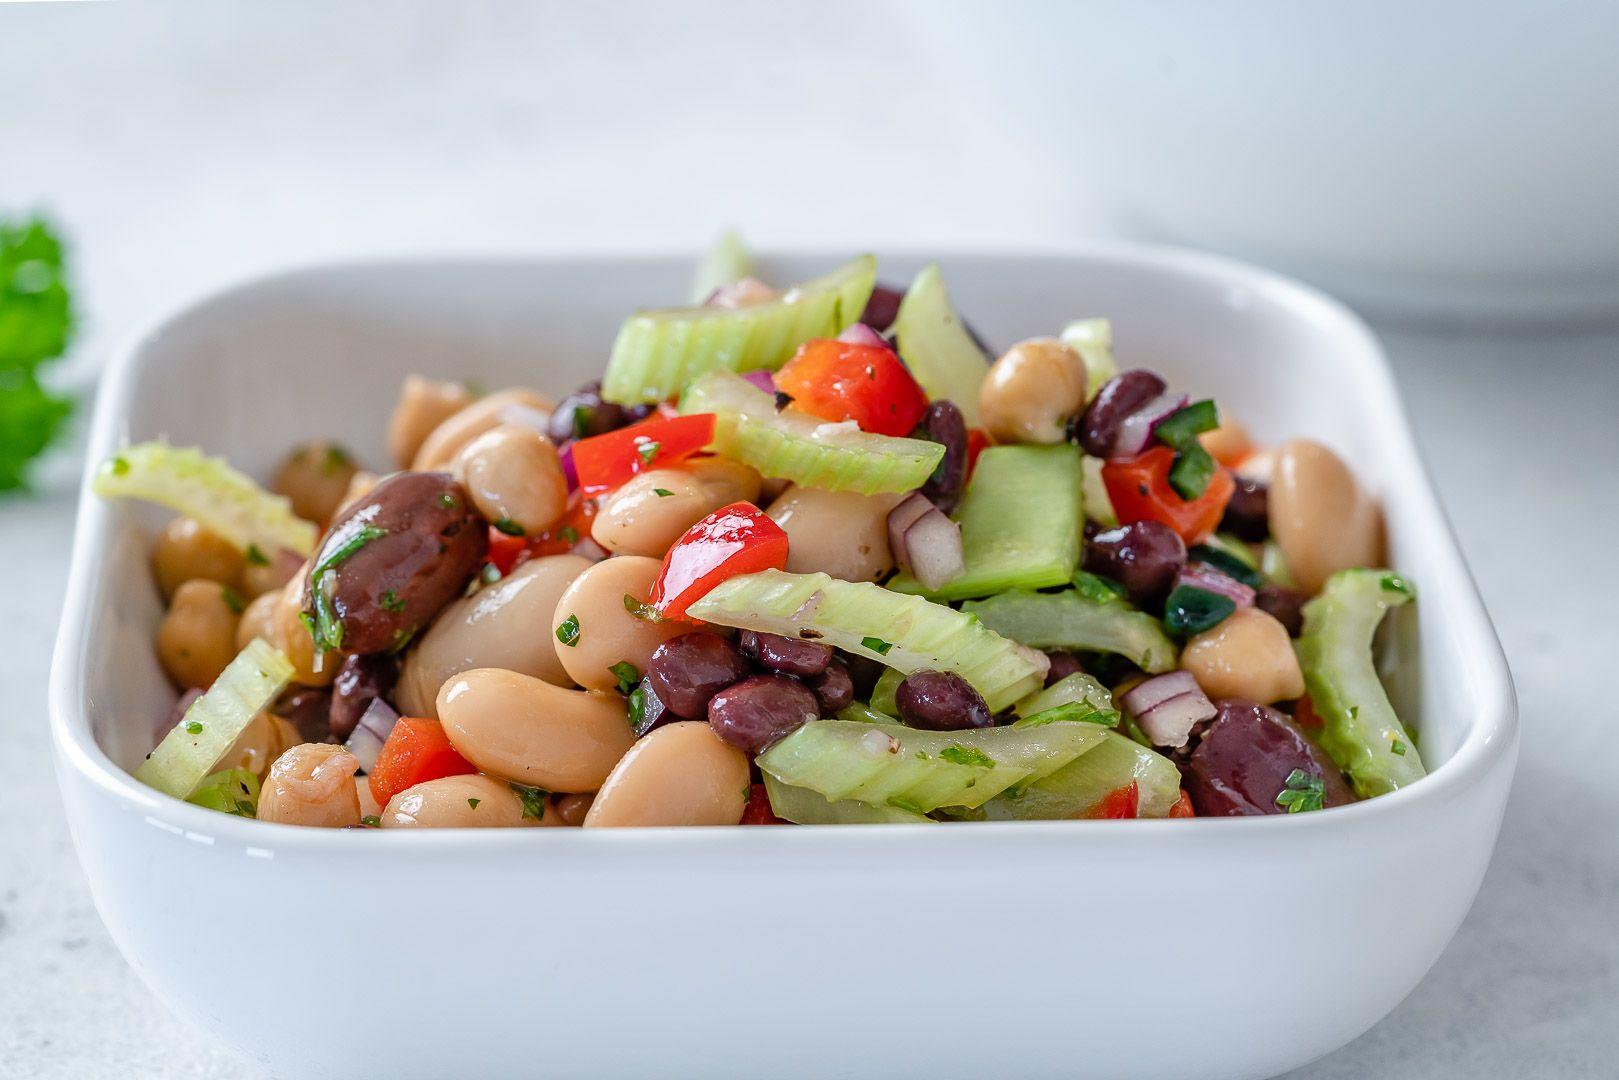 Marinated 3 Bean Salad Recipe In 2020 Clean Food Crush Bean Salad 3 Bean Salad